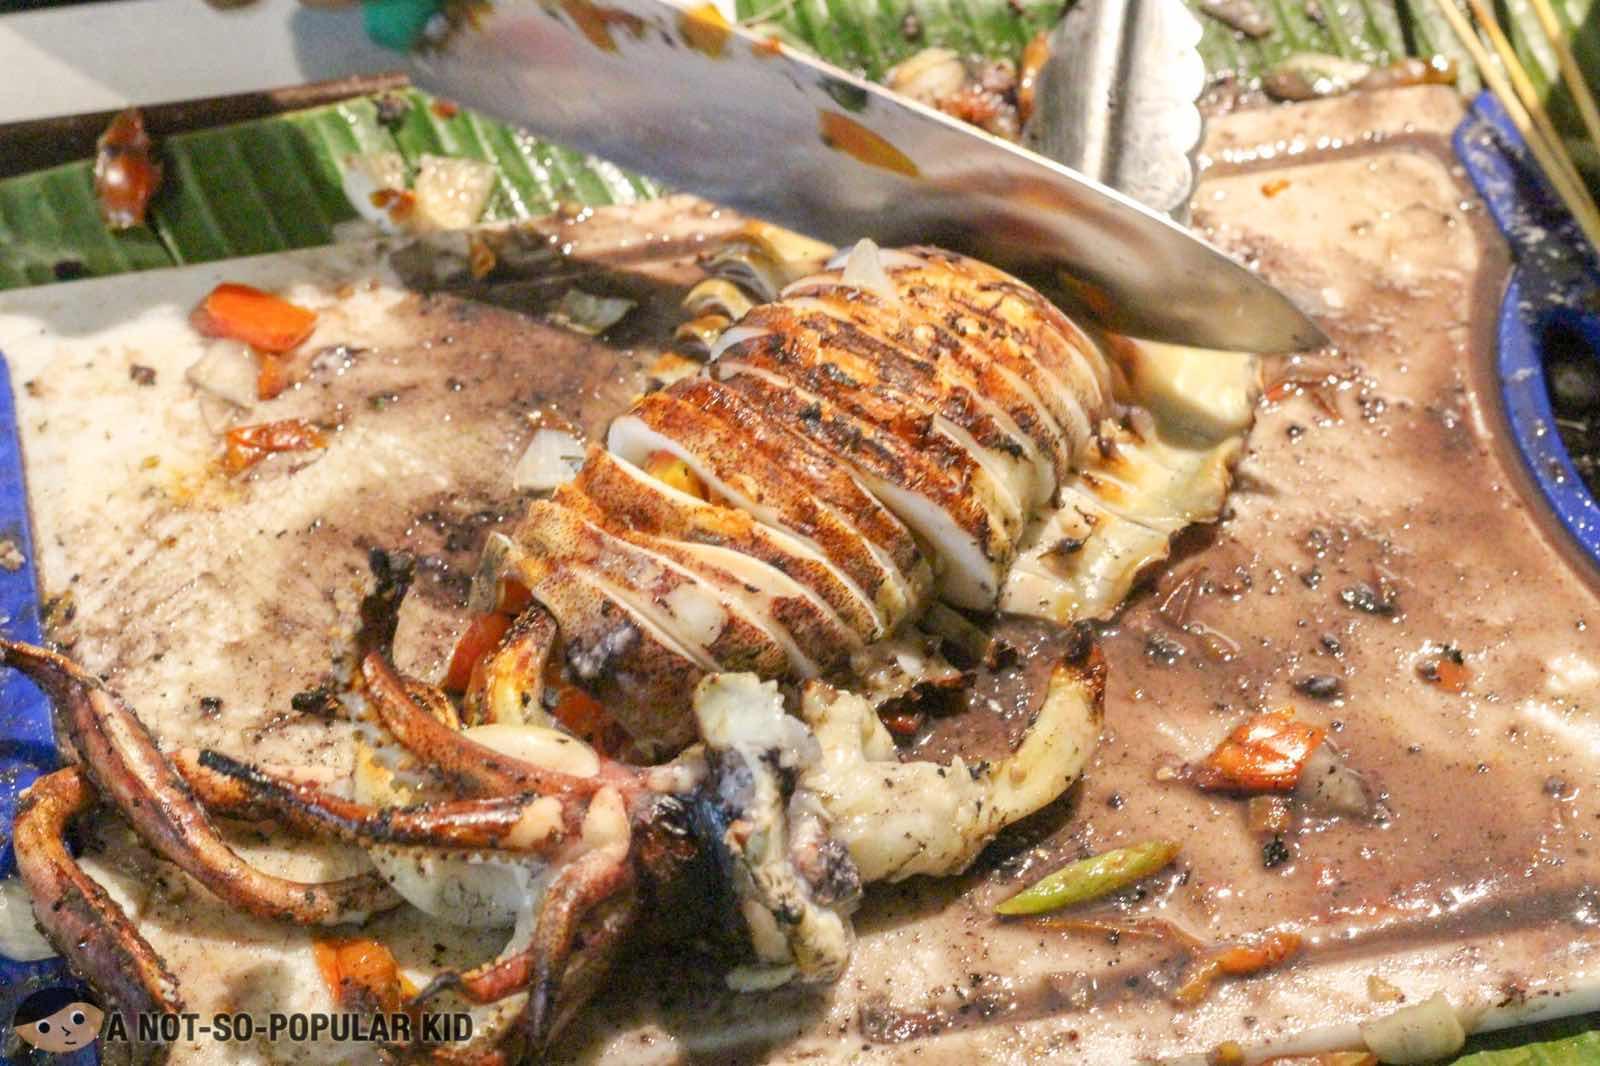 Ningnangan Seafood Paluto in Marilao, Bulacan